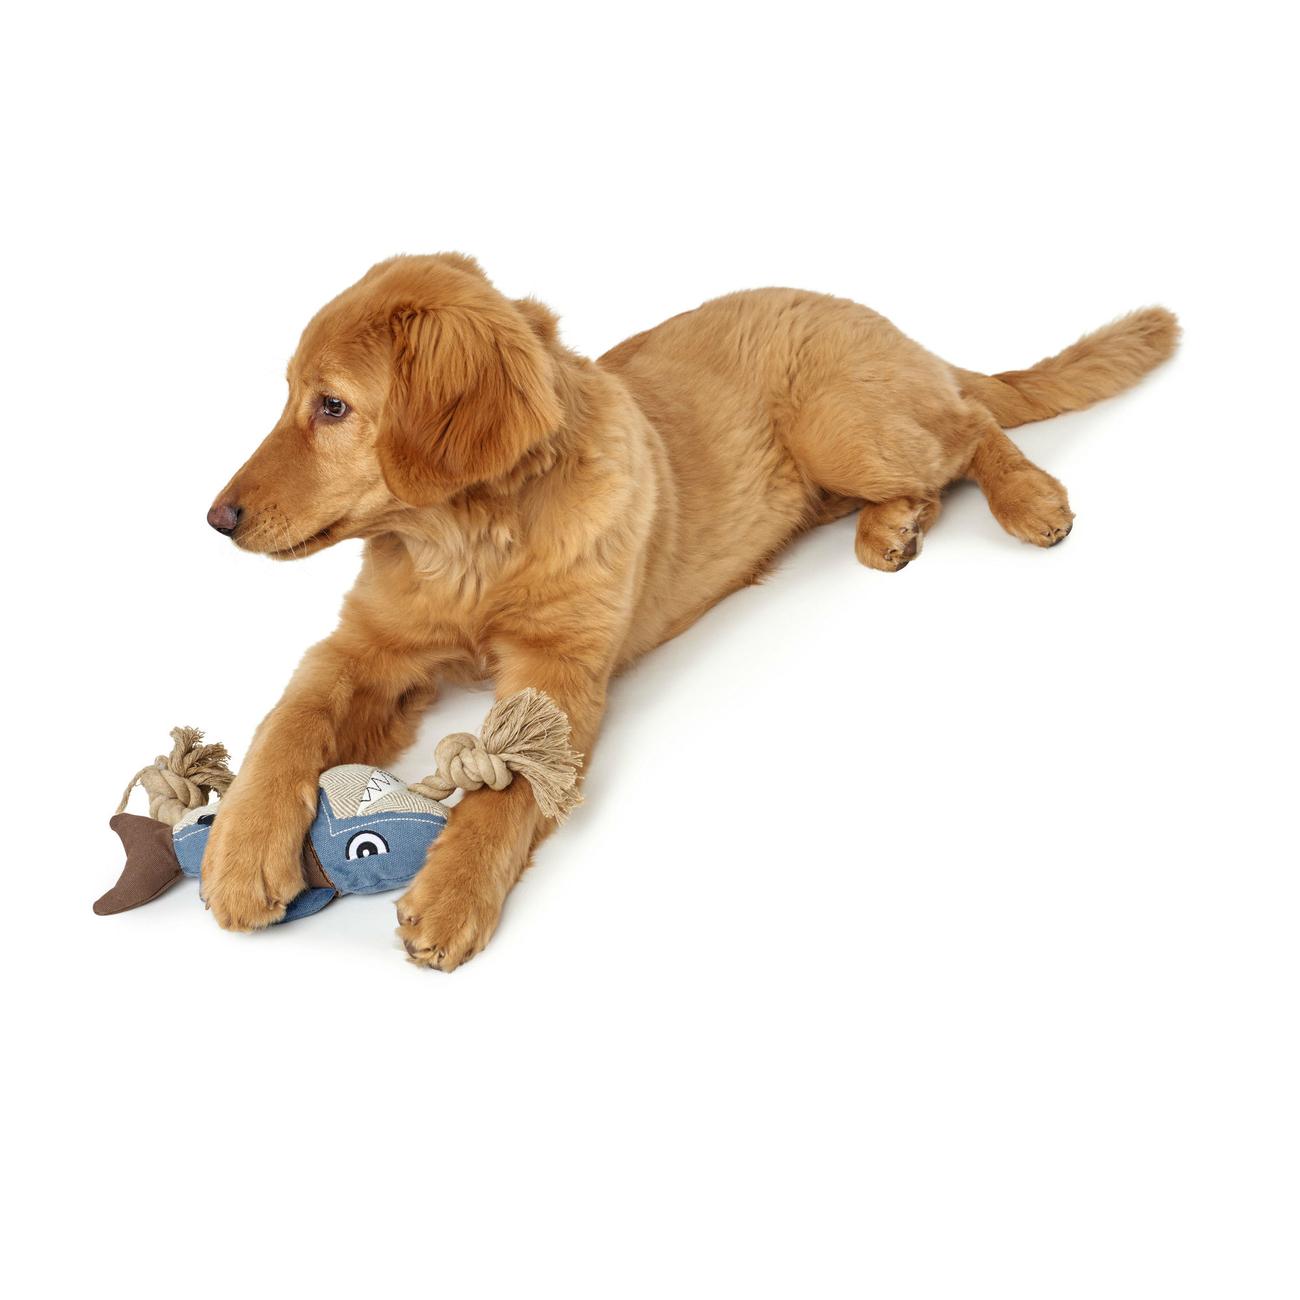 Hunter Hundespielzeug Canvas Sansibar Rantum 65660, Bild 4